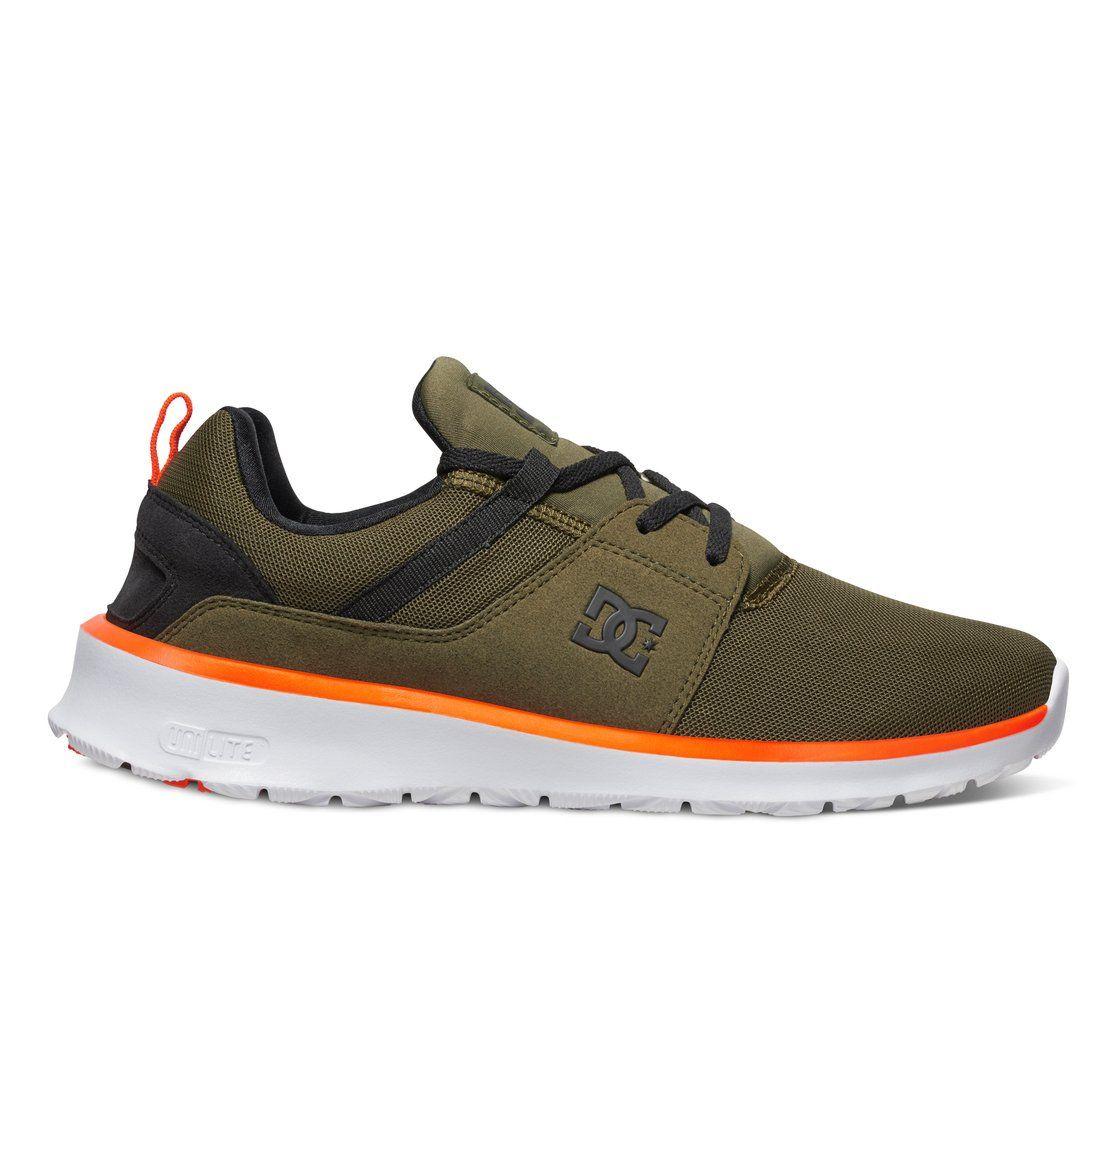 dcshoes, Heathrow - Low-Top Shoes, BLACK/WHITE (bkw)